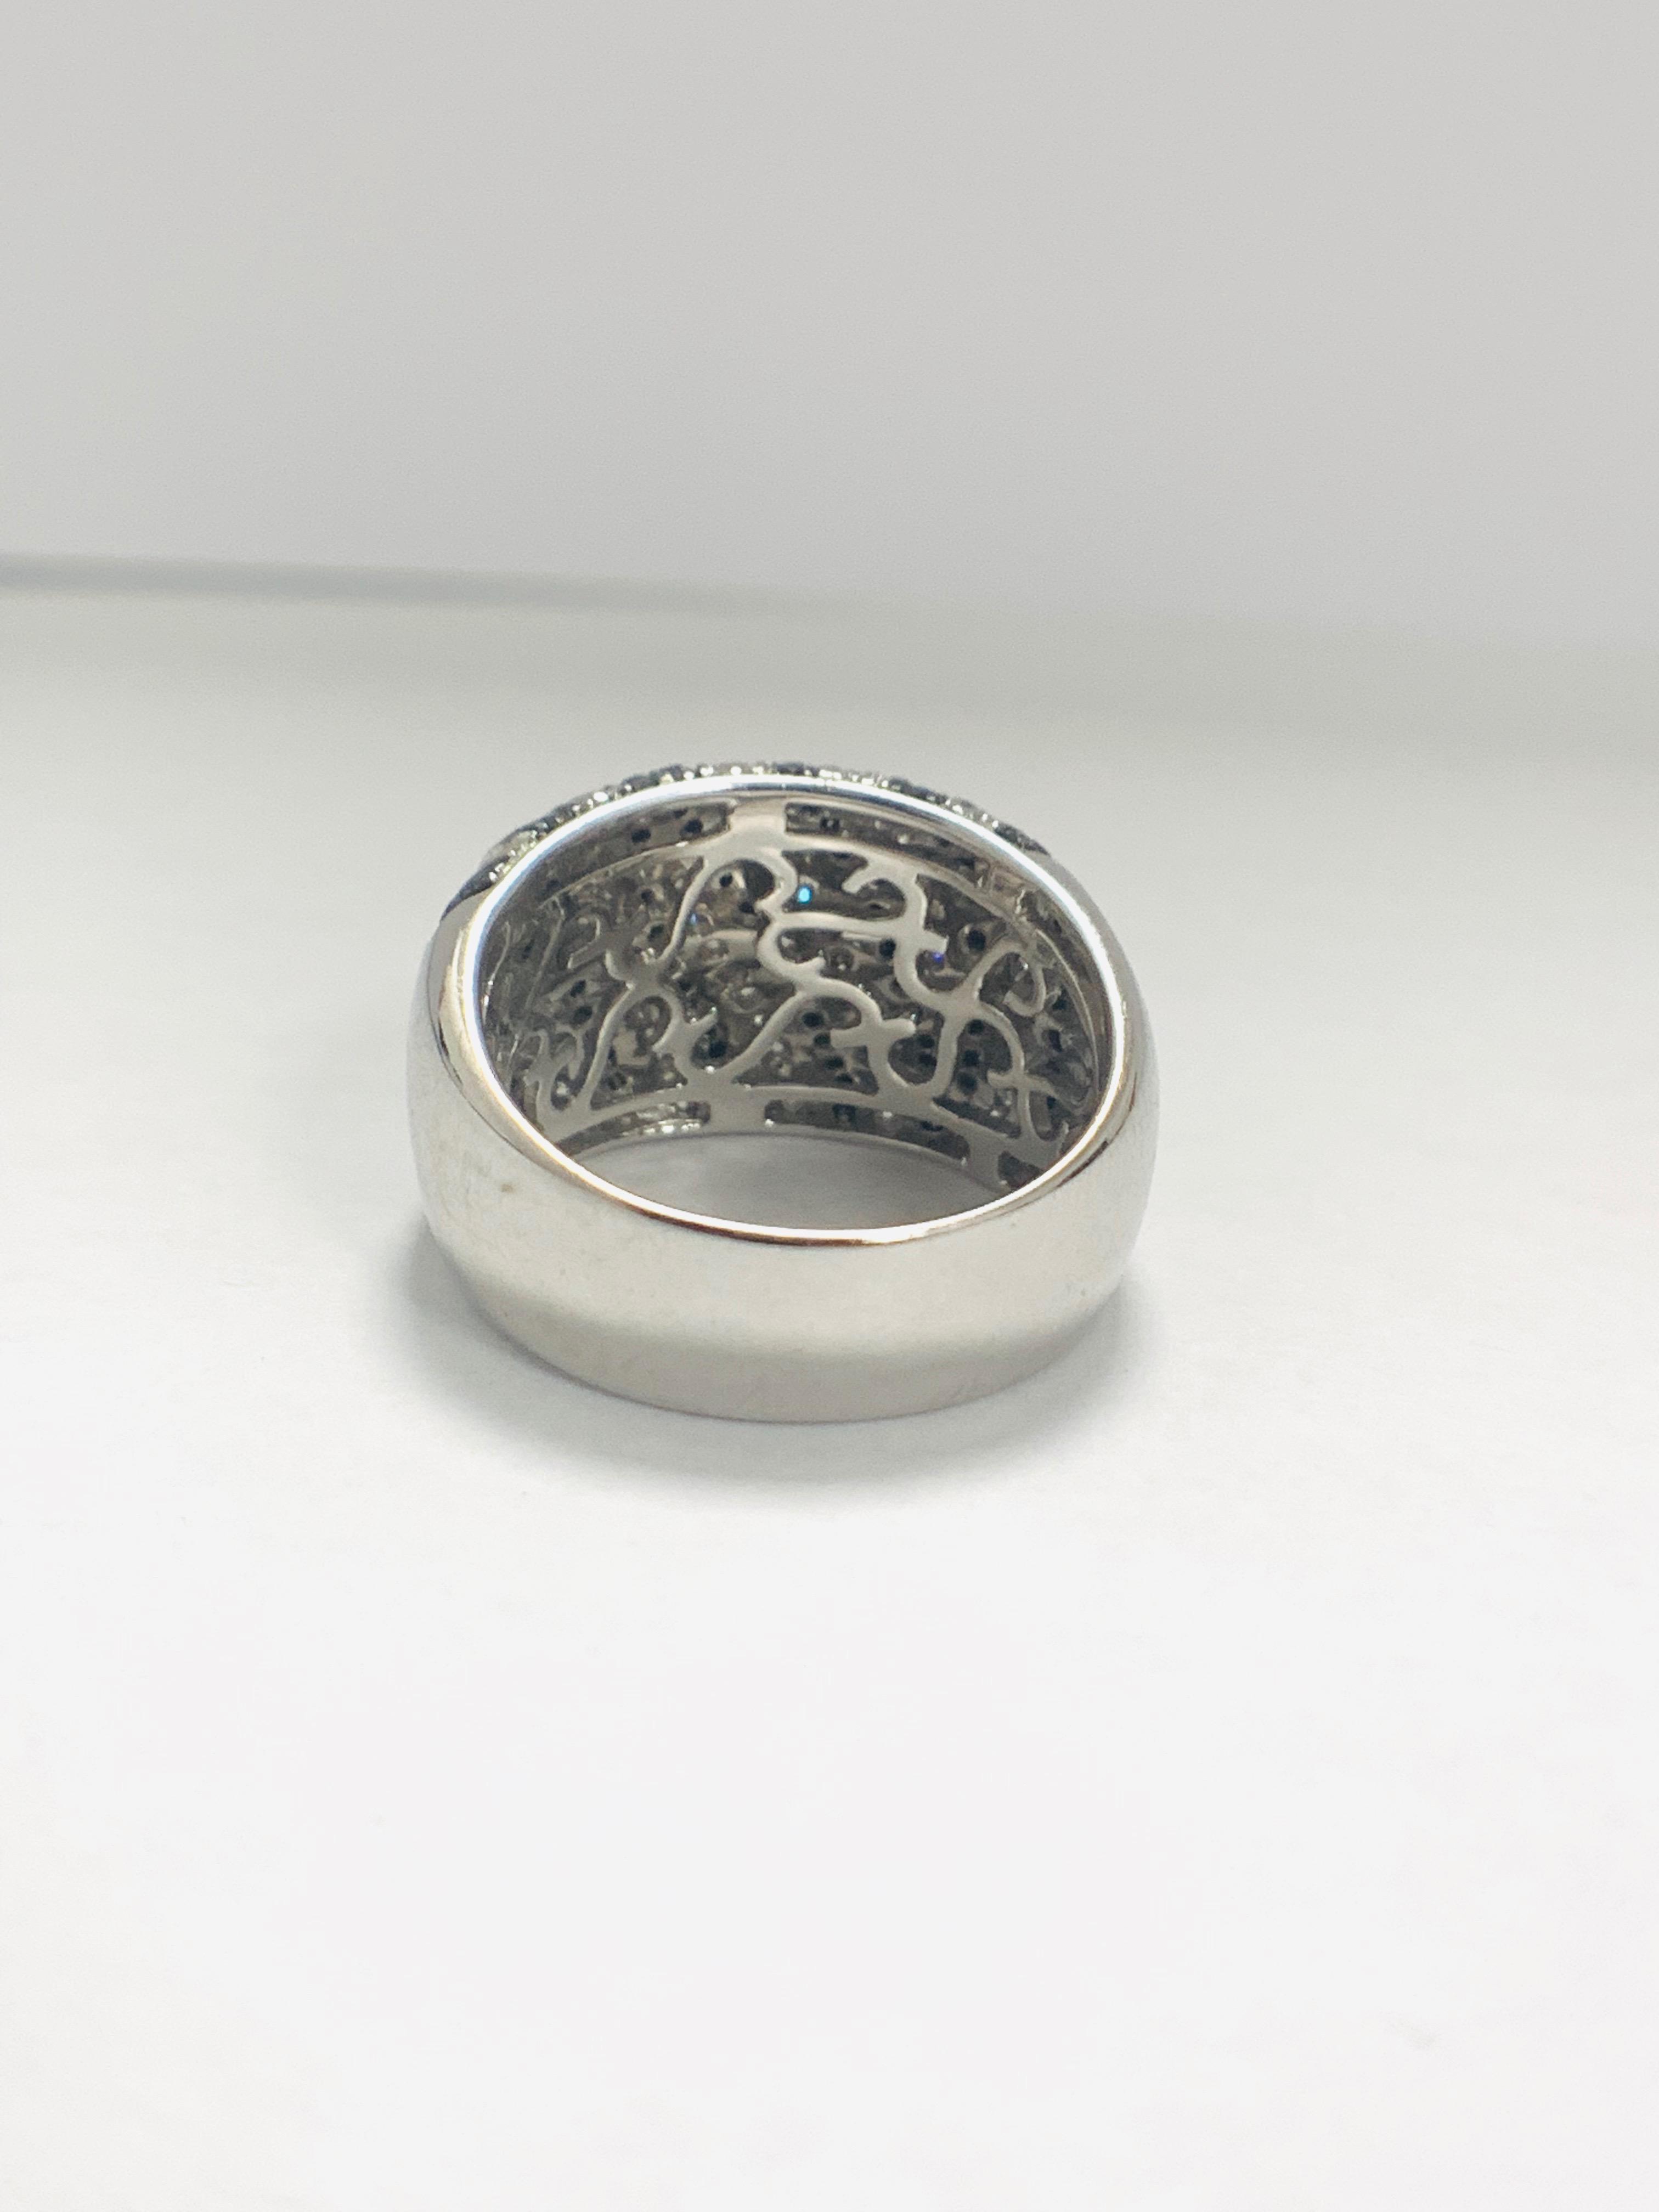 18ct White Gold Diamond ring - Image 5 of 14